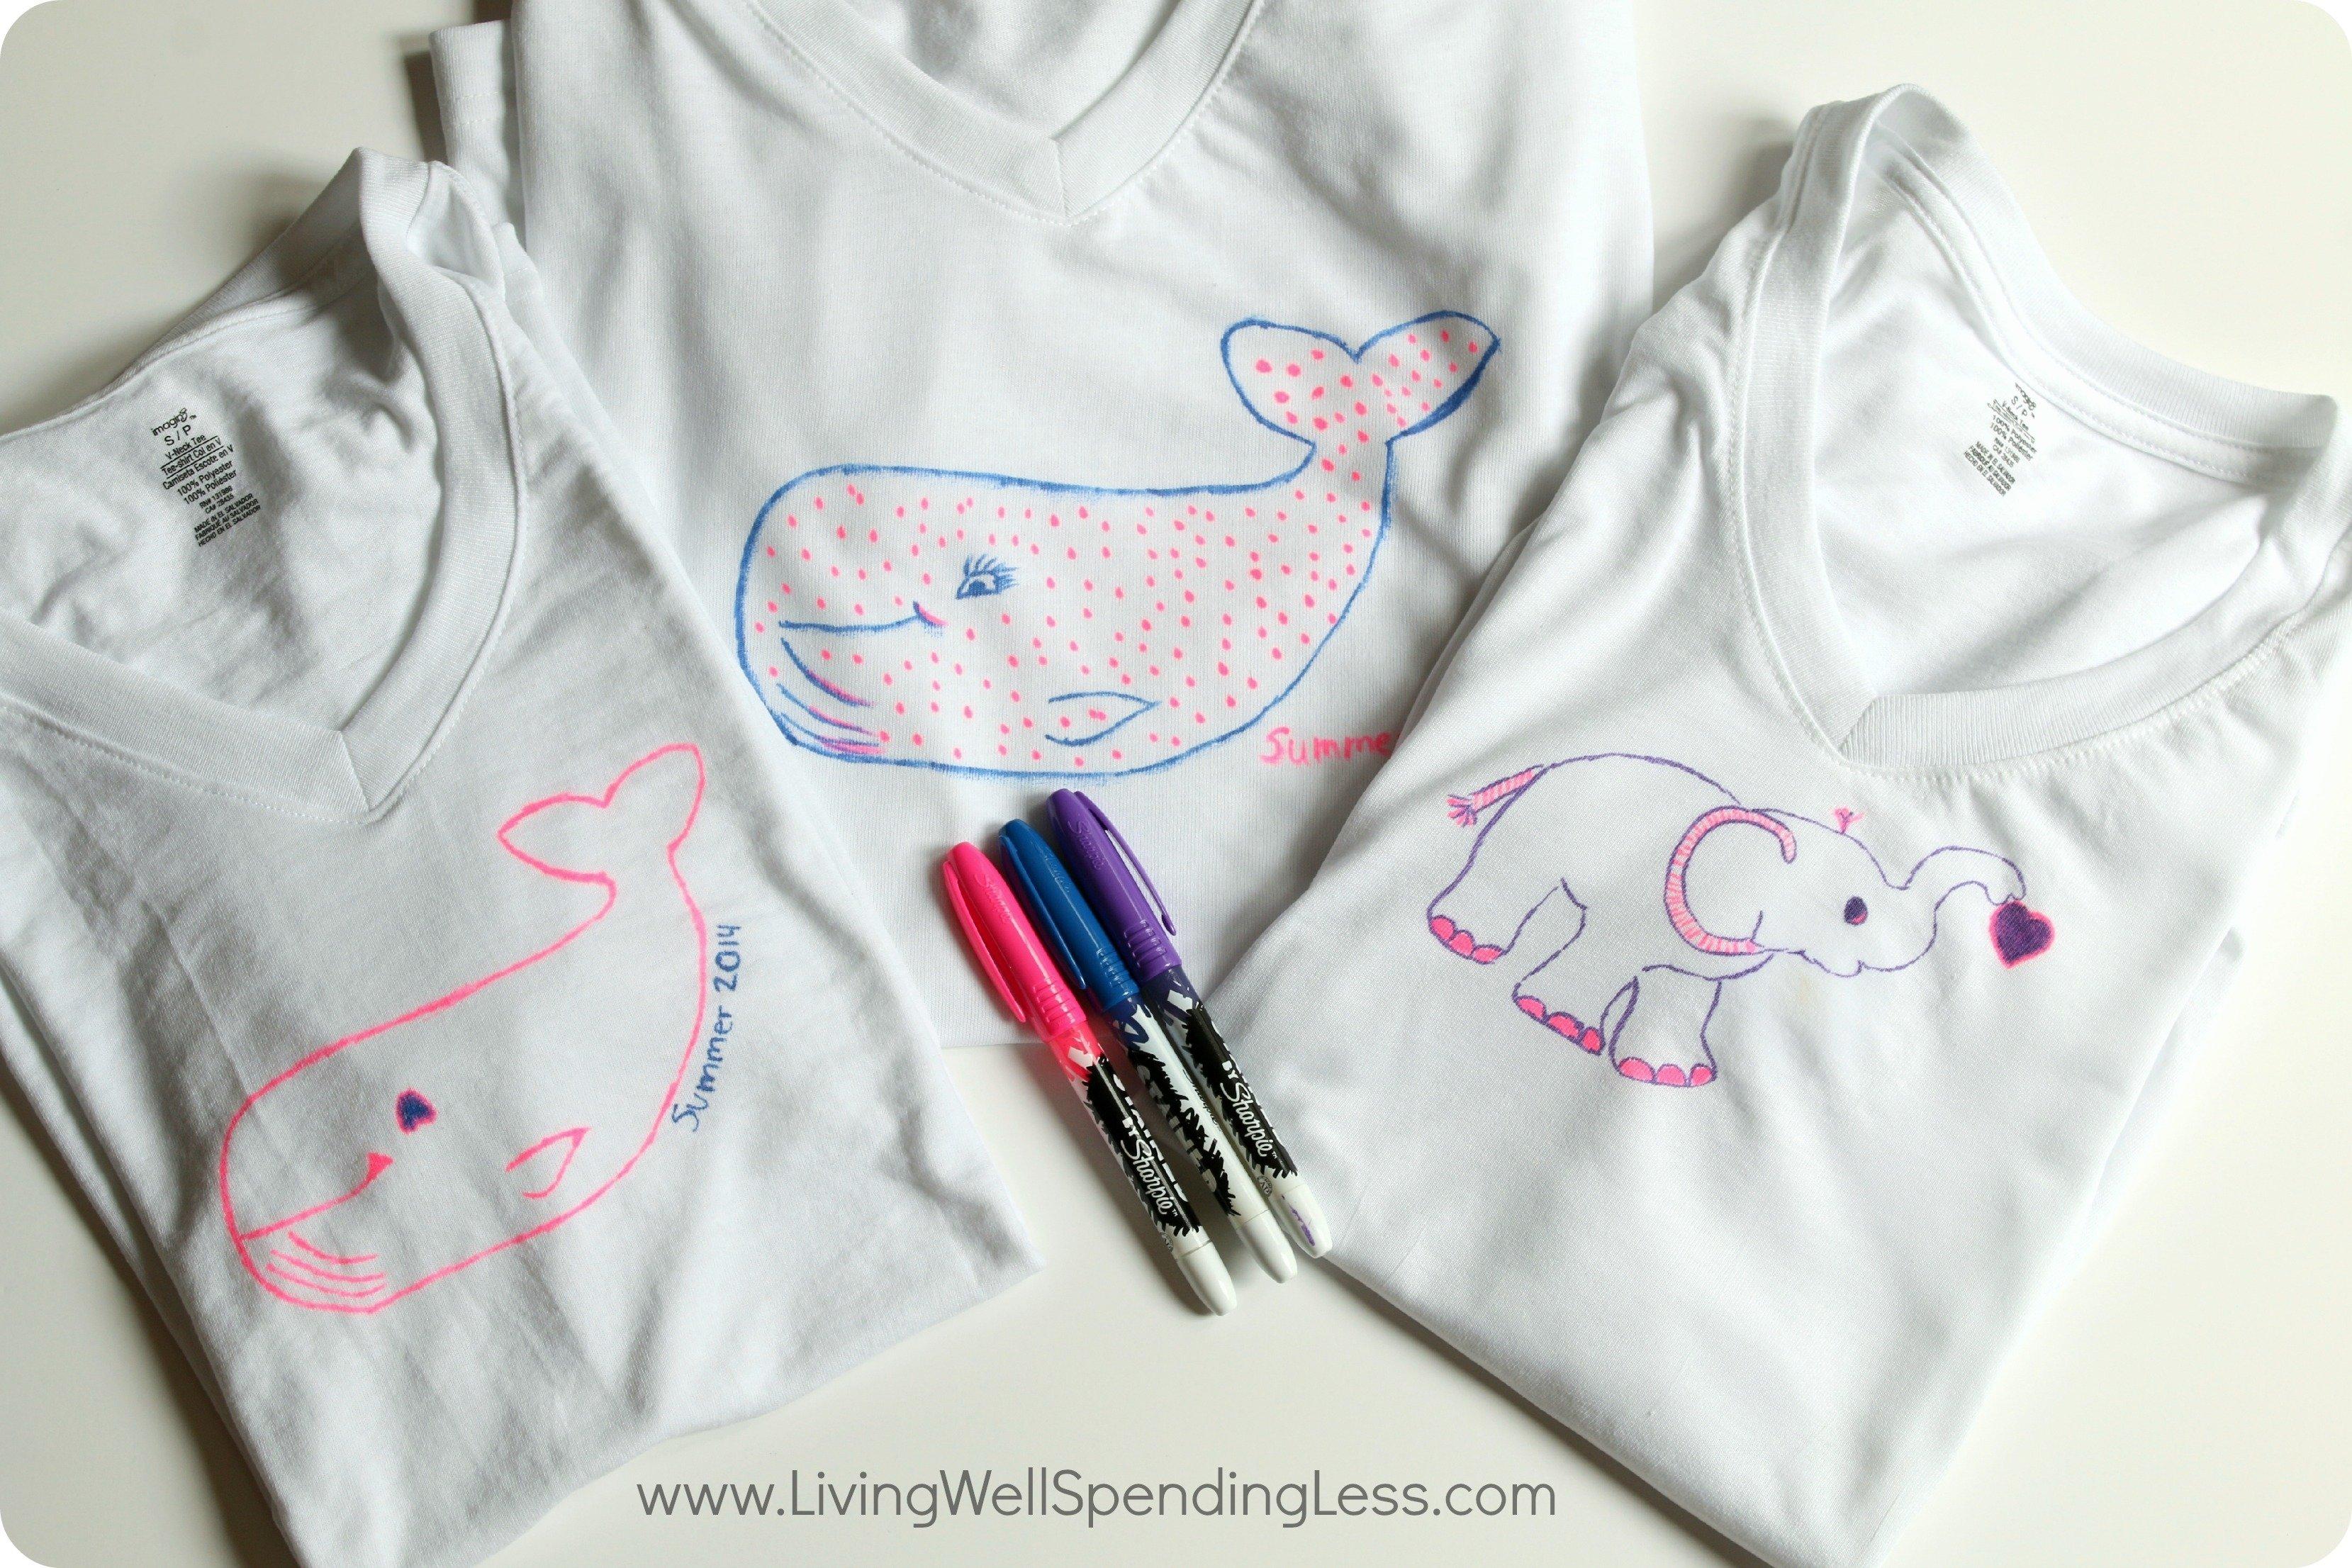 10 Gorgeous Diy T Shirt Design Ideas diy sharpie stained t shirts diy t shirt diy crafts diy 2020